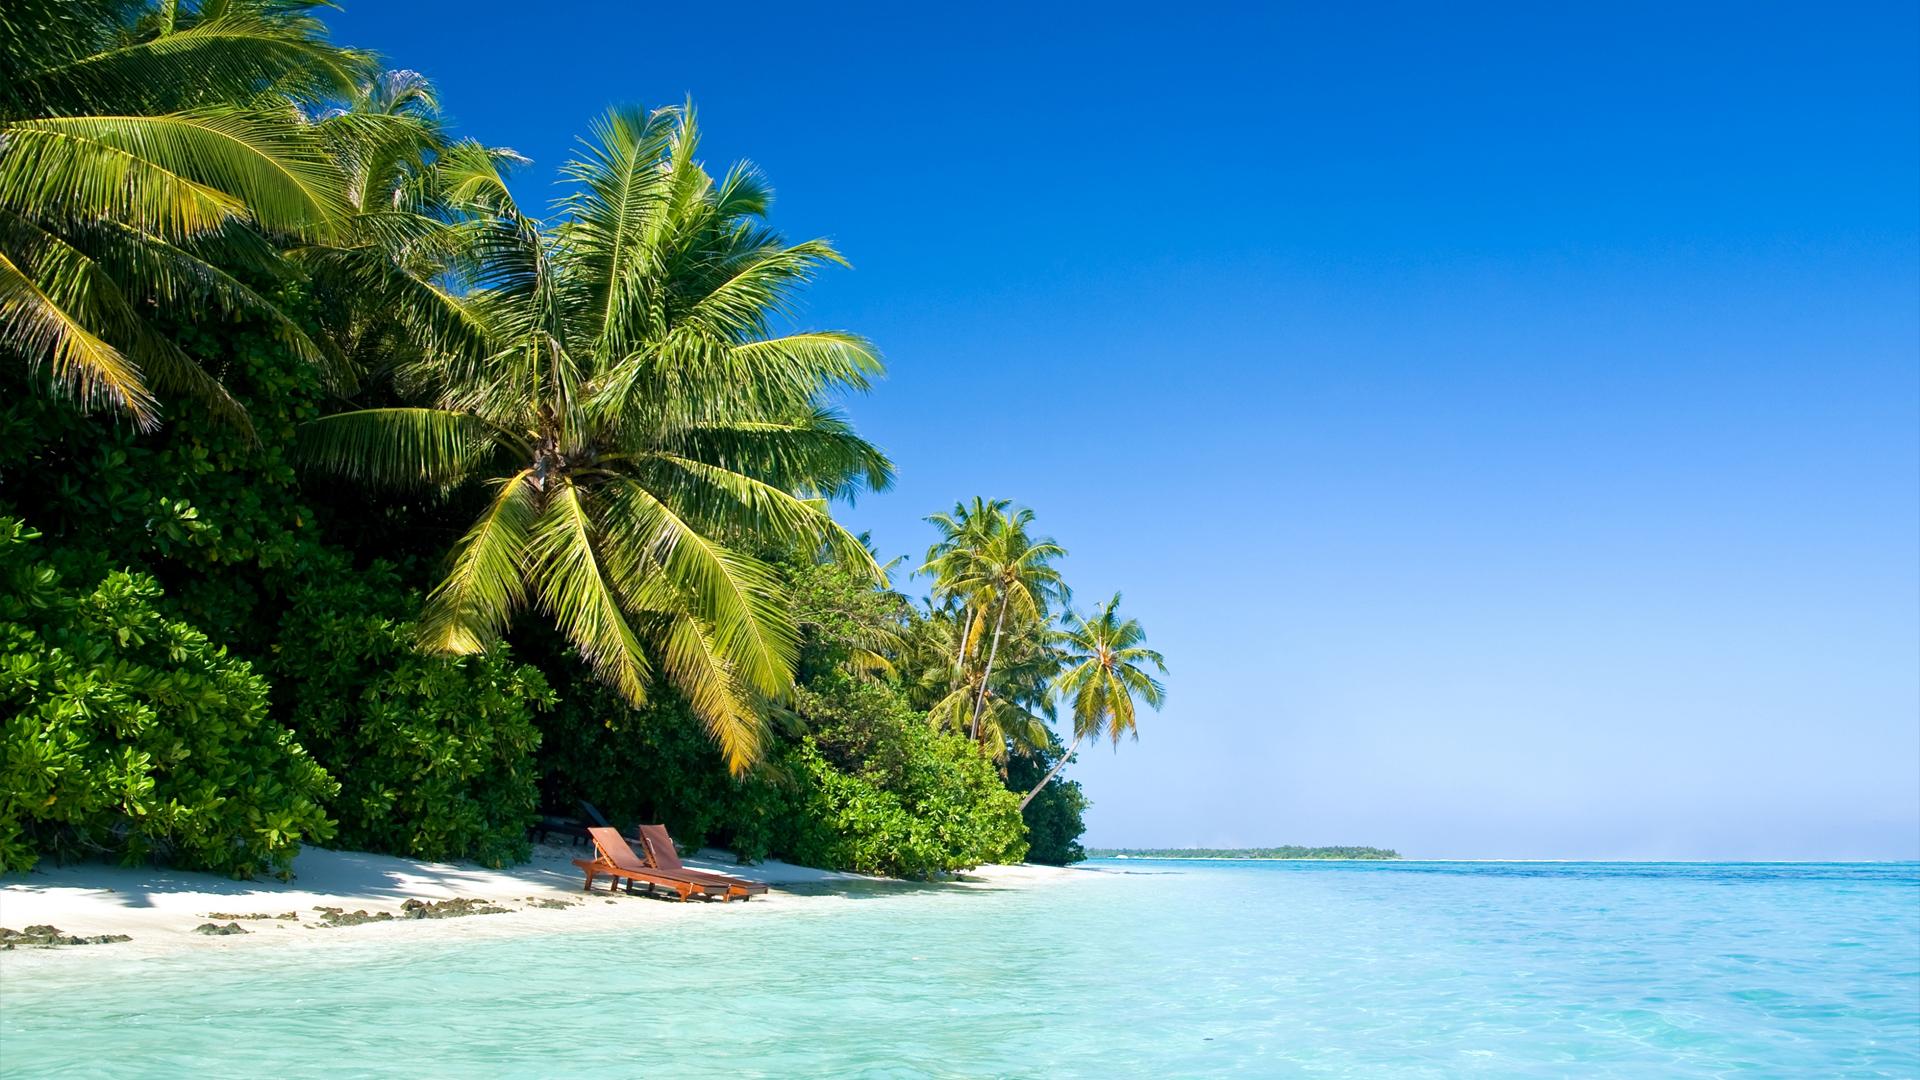 Hd Windows 10 Wallpaper Maldives Nature - Palm Tree Beach - HD Wallpaper